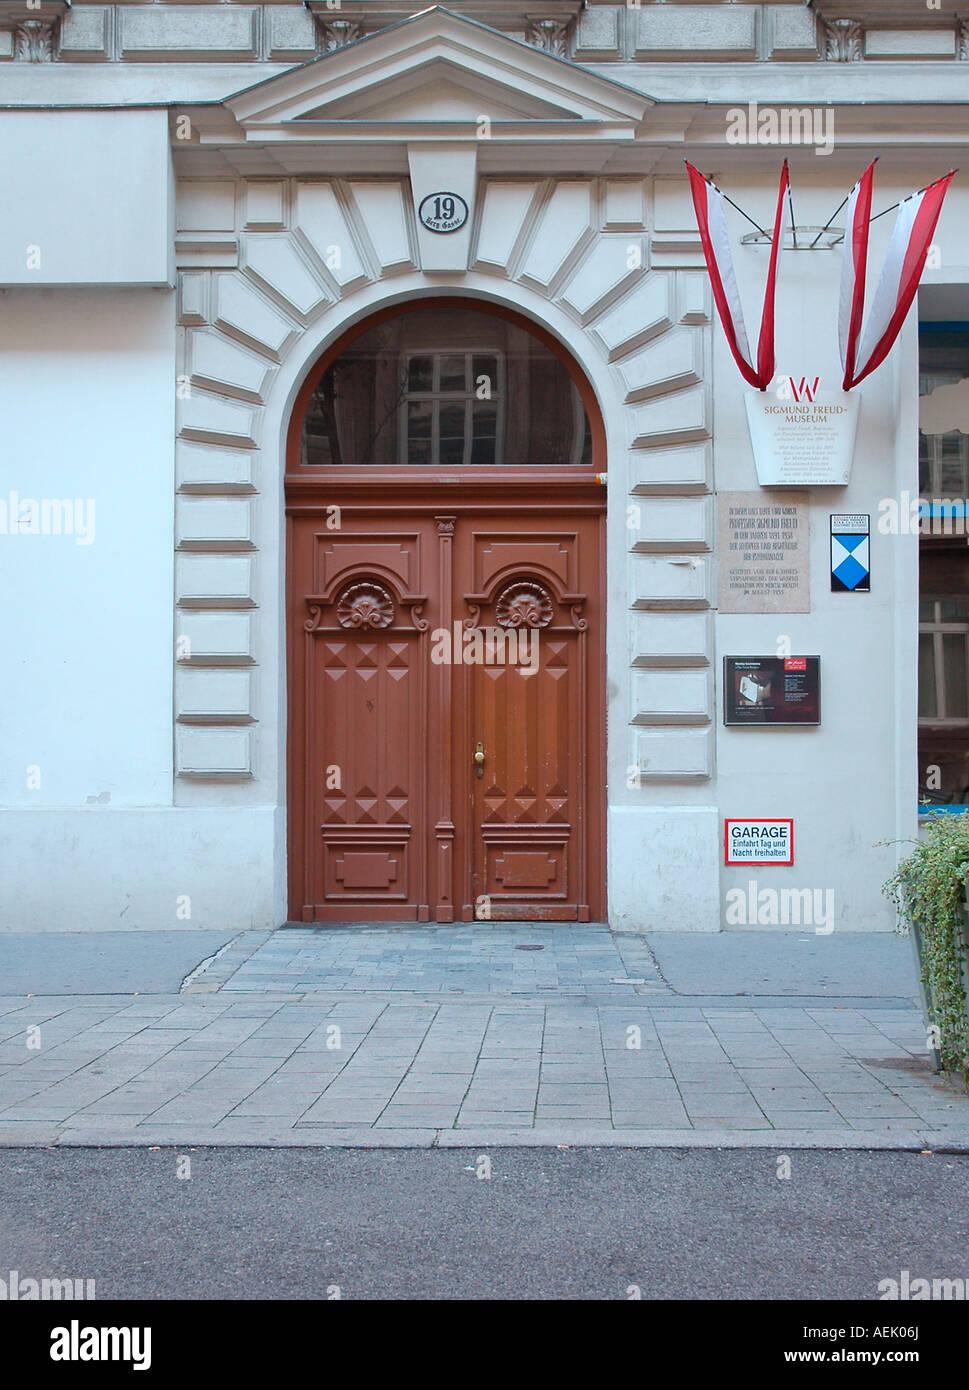 Entrance to the apartment of Sigmund Freud, Berggasse 19, Vienna, Austria - Stock Image